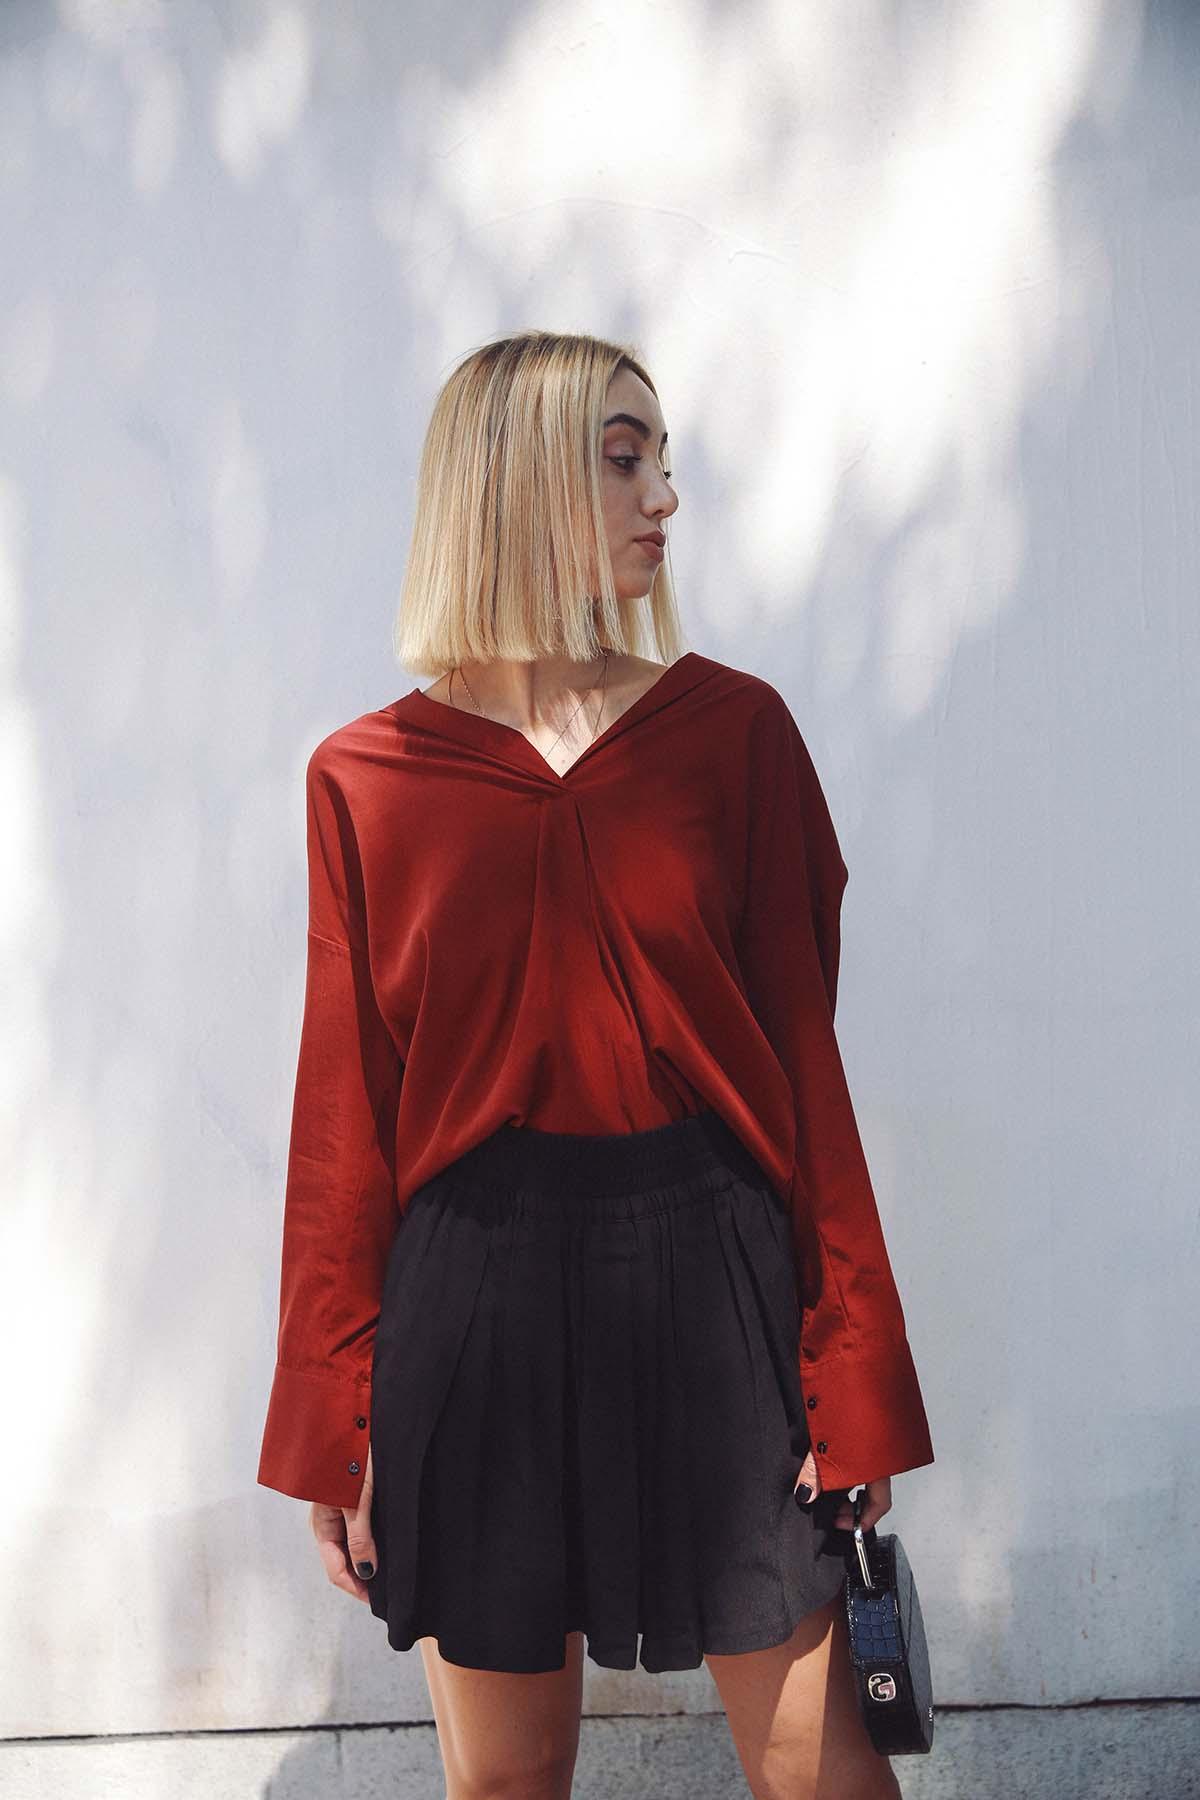 Ana Prodanovich wearing autumnal burgundy.